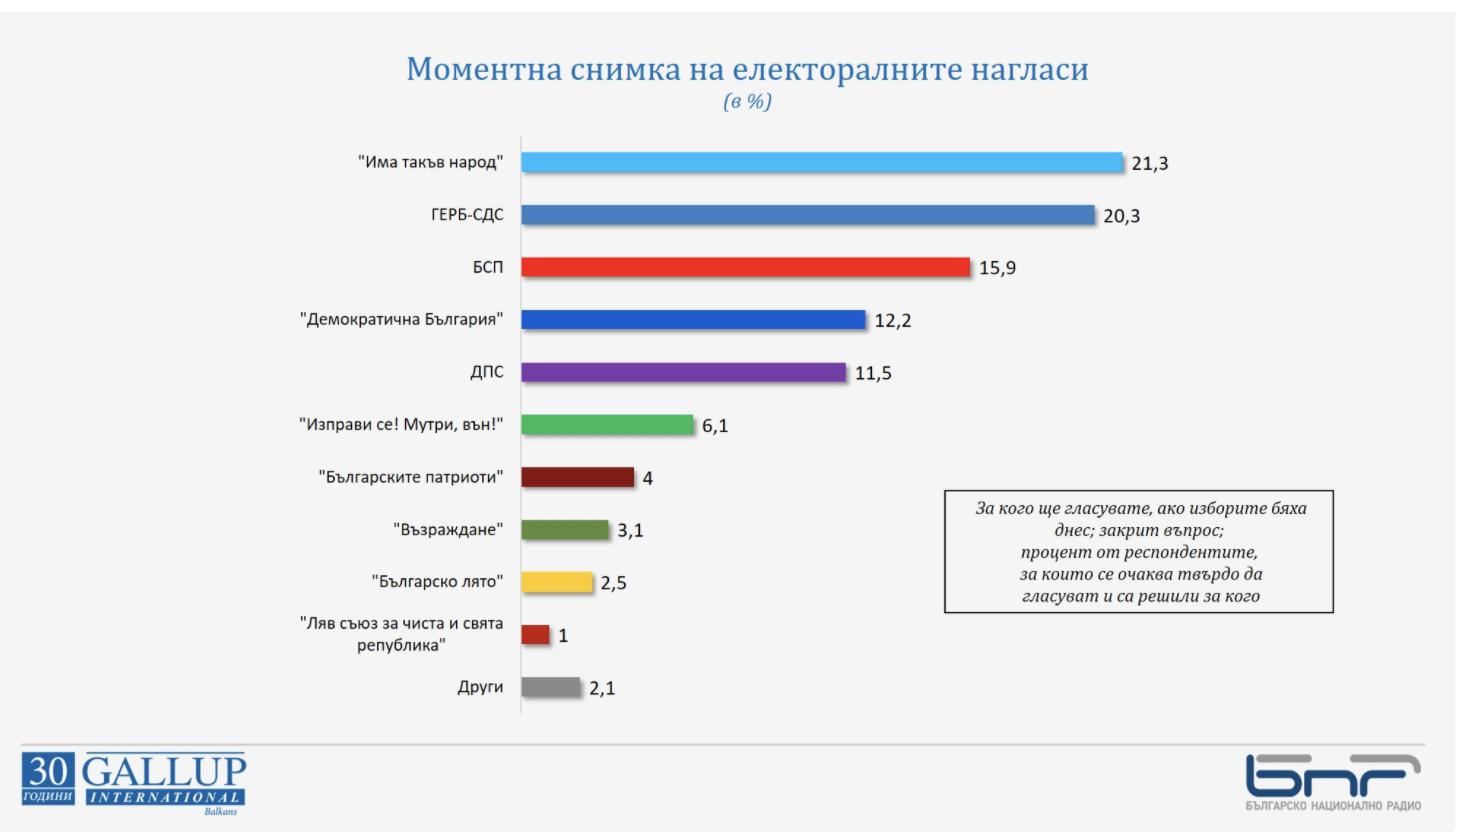 Bugarska: Nepredvidivost izbora važan faktor, smatra Galup